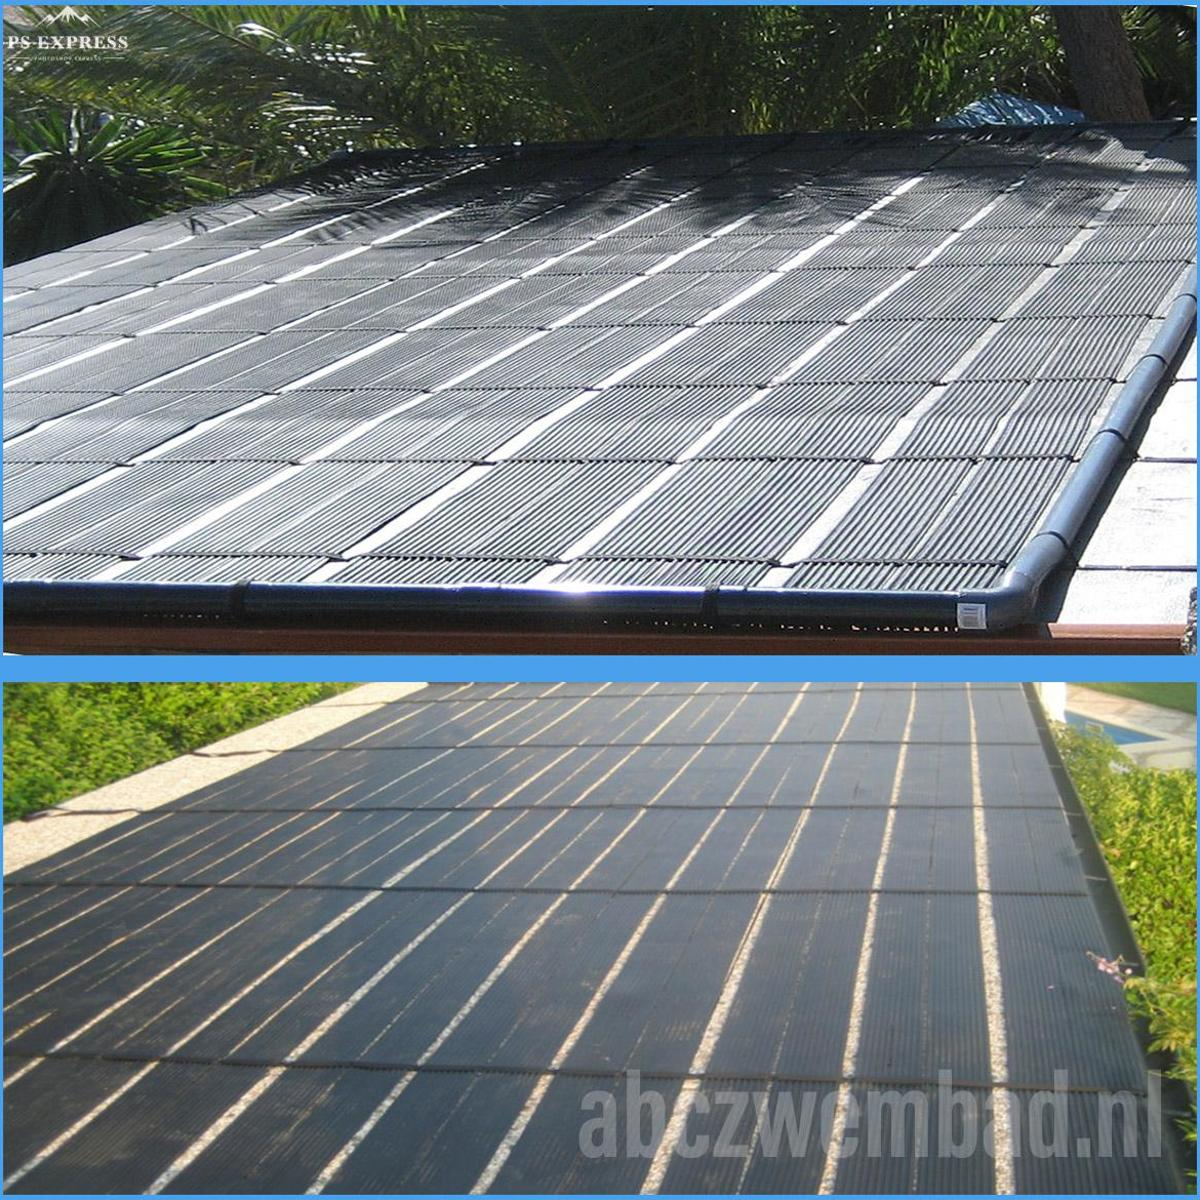 8m2 solar 2.00m x 4.00m zwembadverwarming